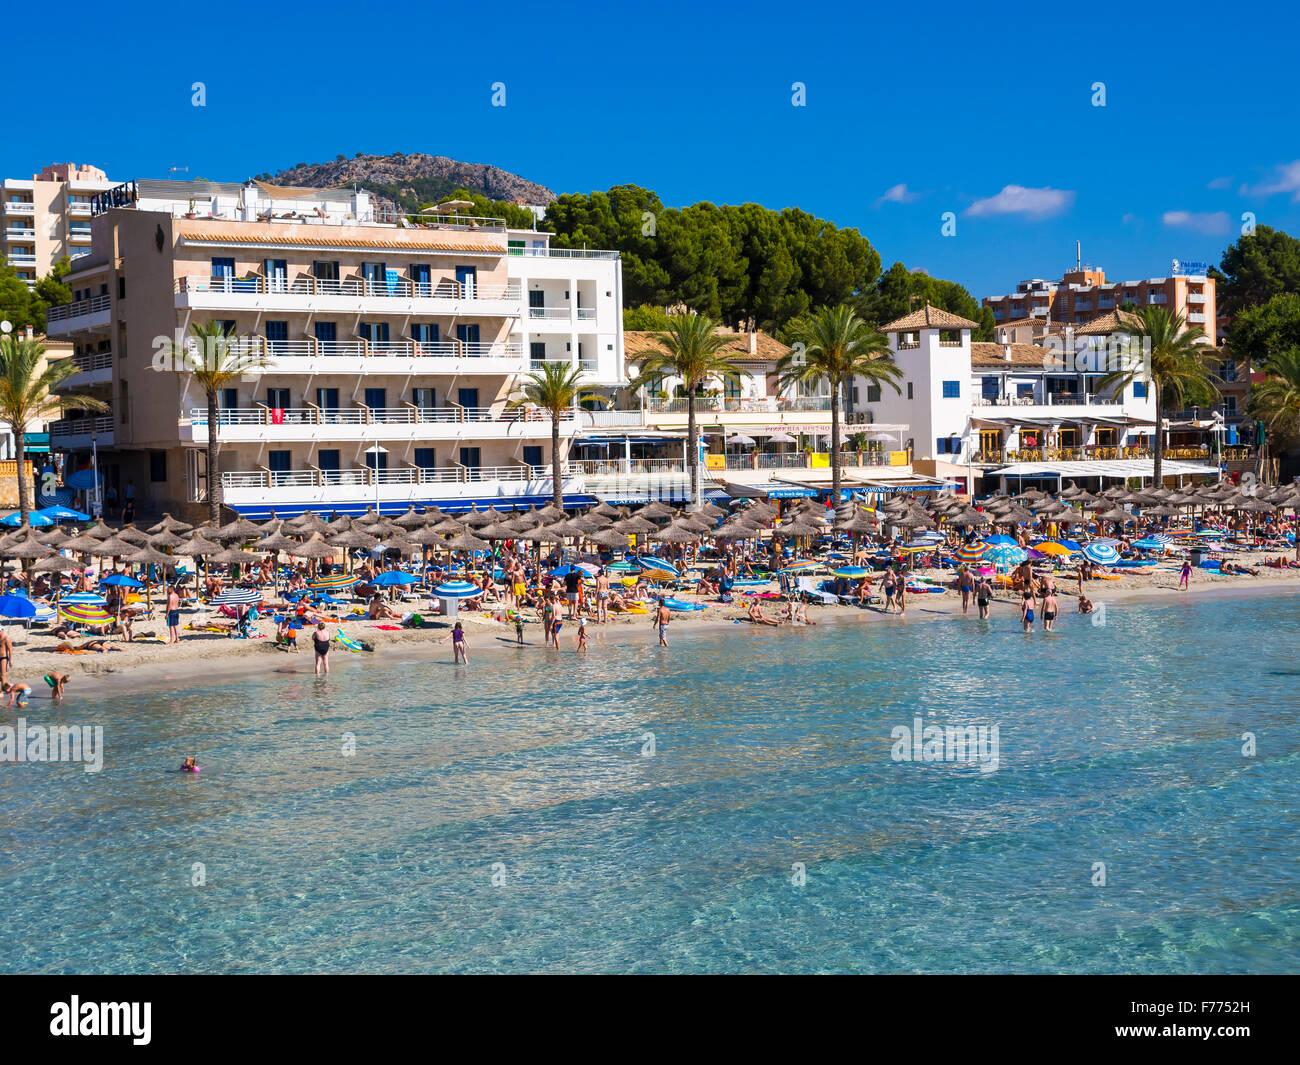 Bustling beach of Peguera, Mallorca, Balearic Islands, Spain - Stock Image